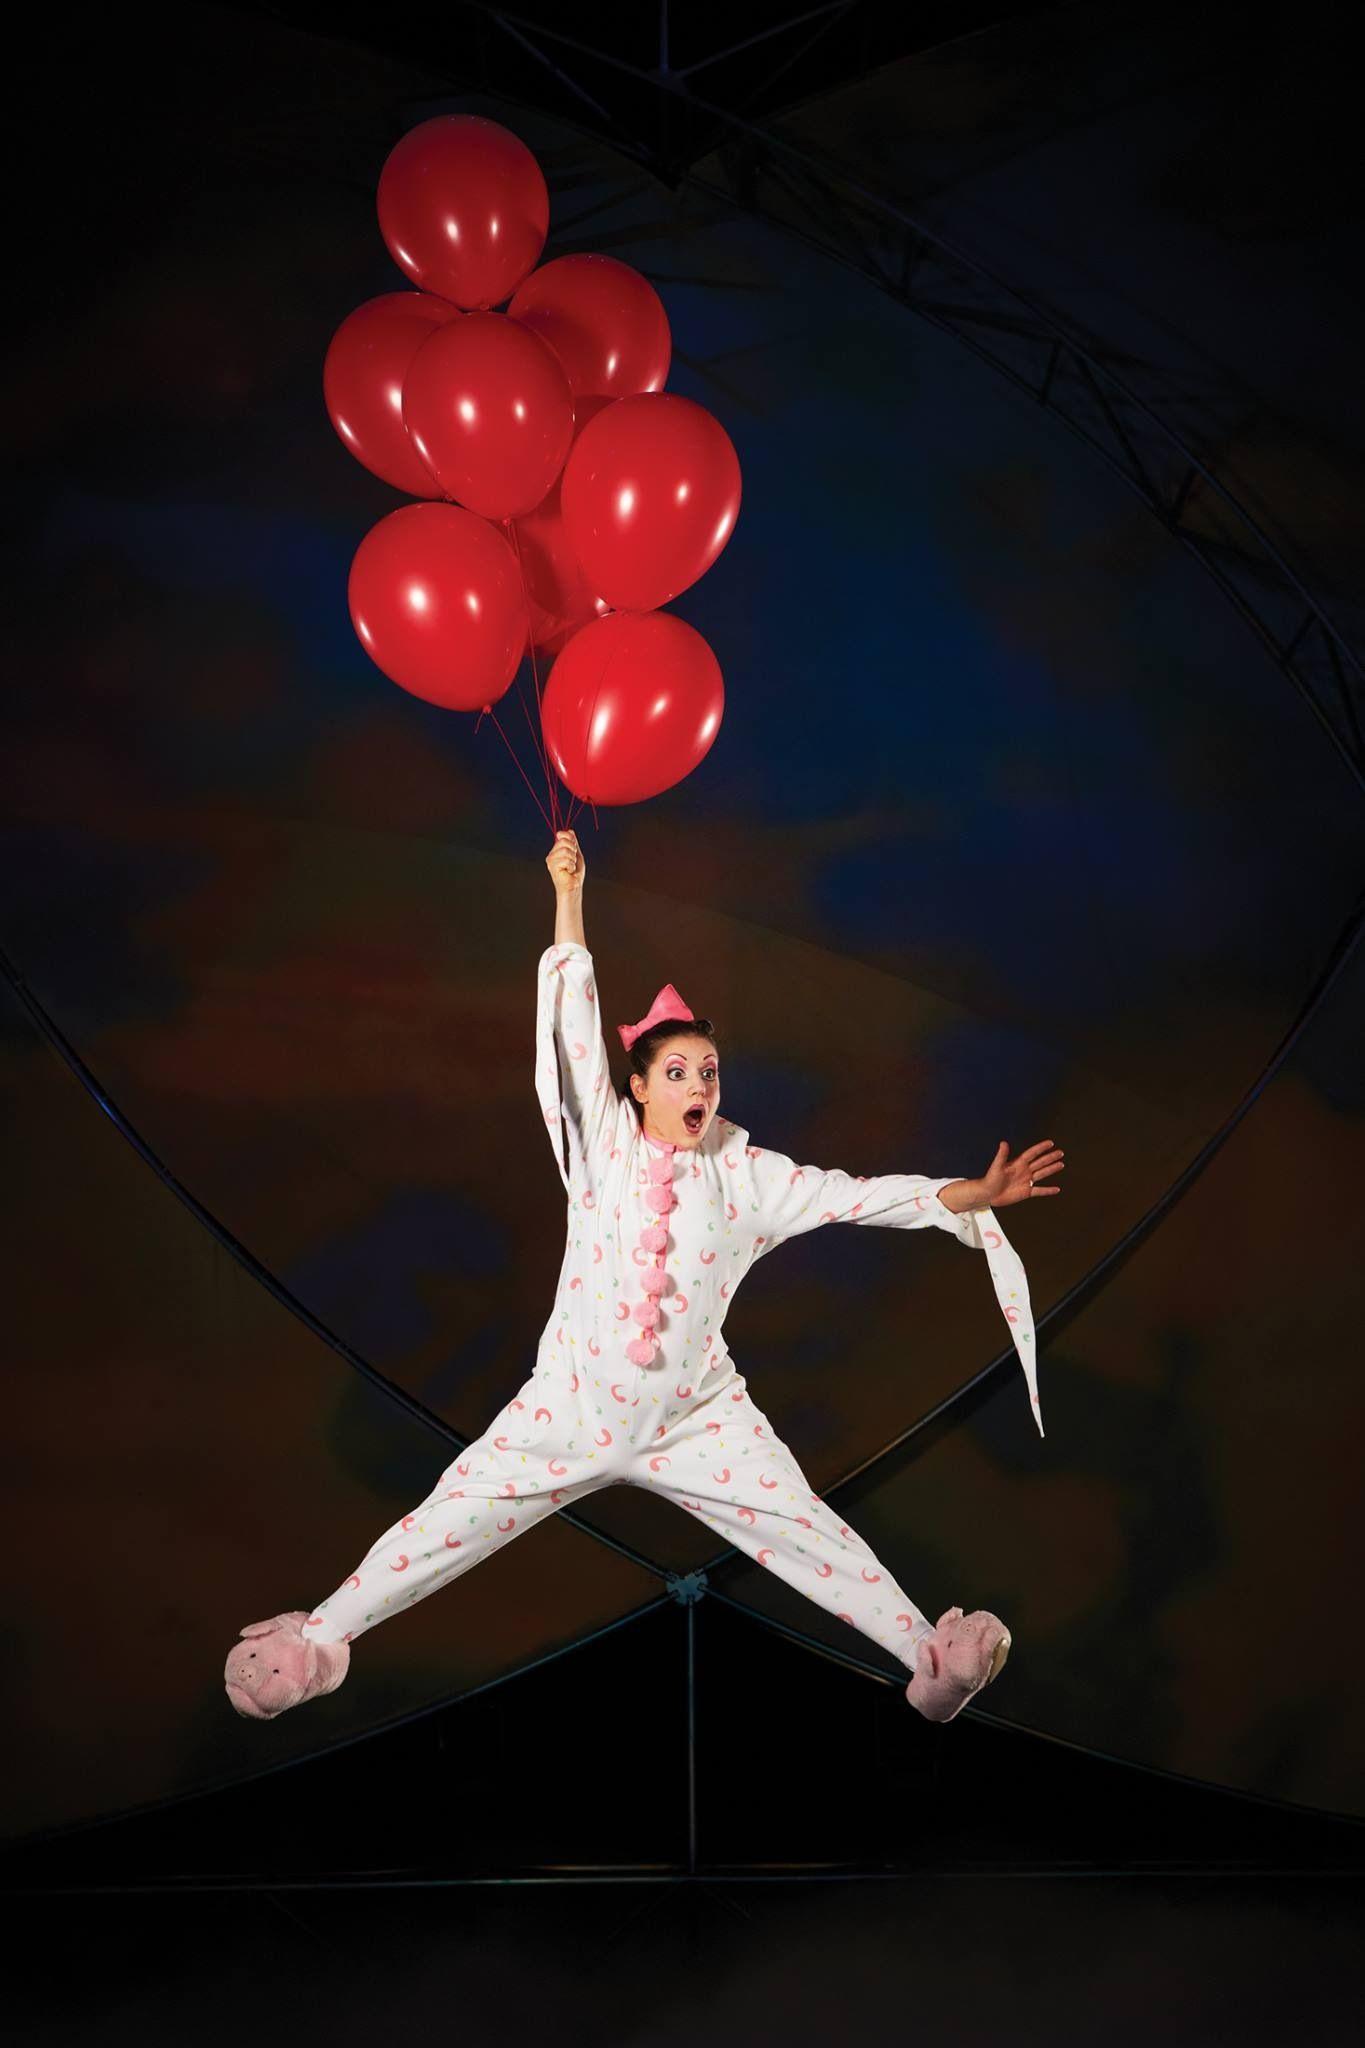 Circus Red White Cirque Du Soleil Mystere Cirque Du Soleil Cirque Du Soleil Personnages De Cirque